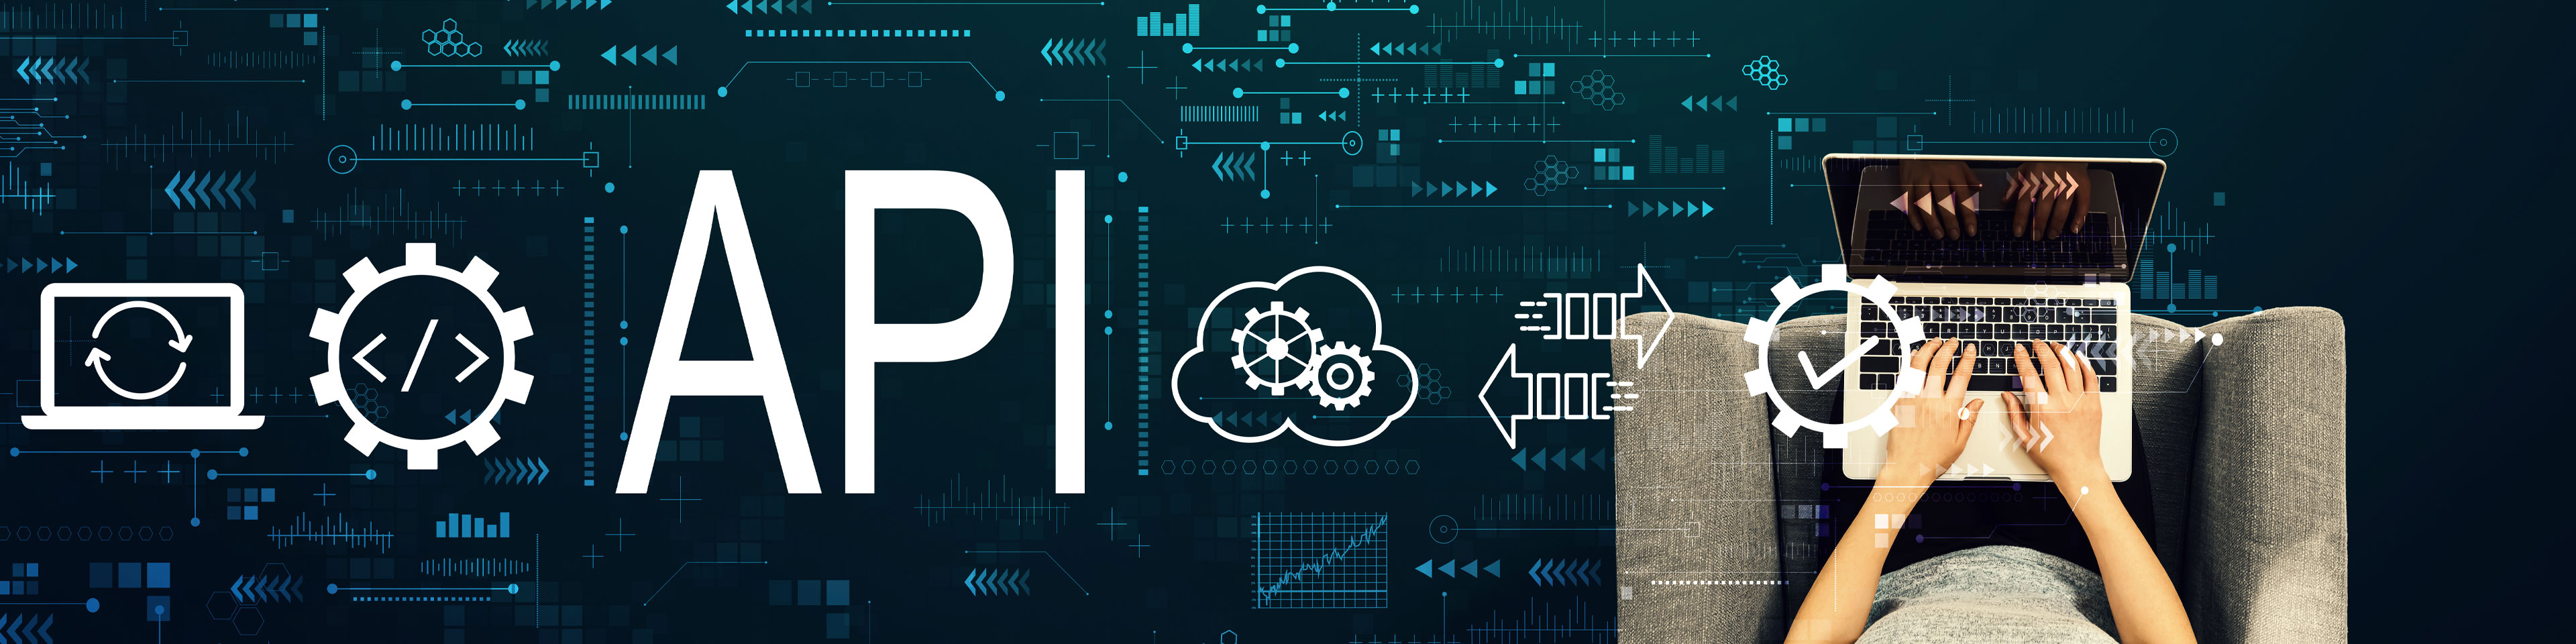 Data APIs